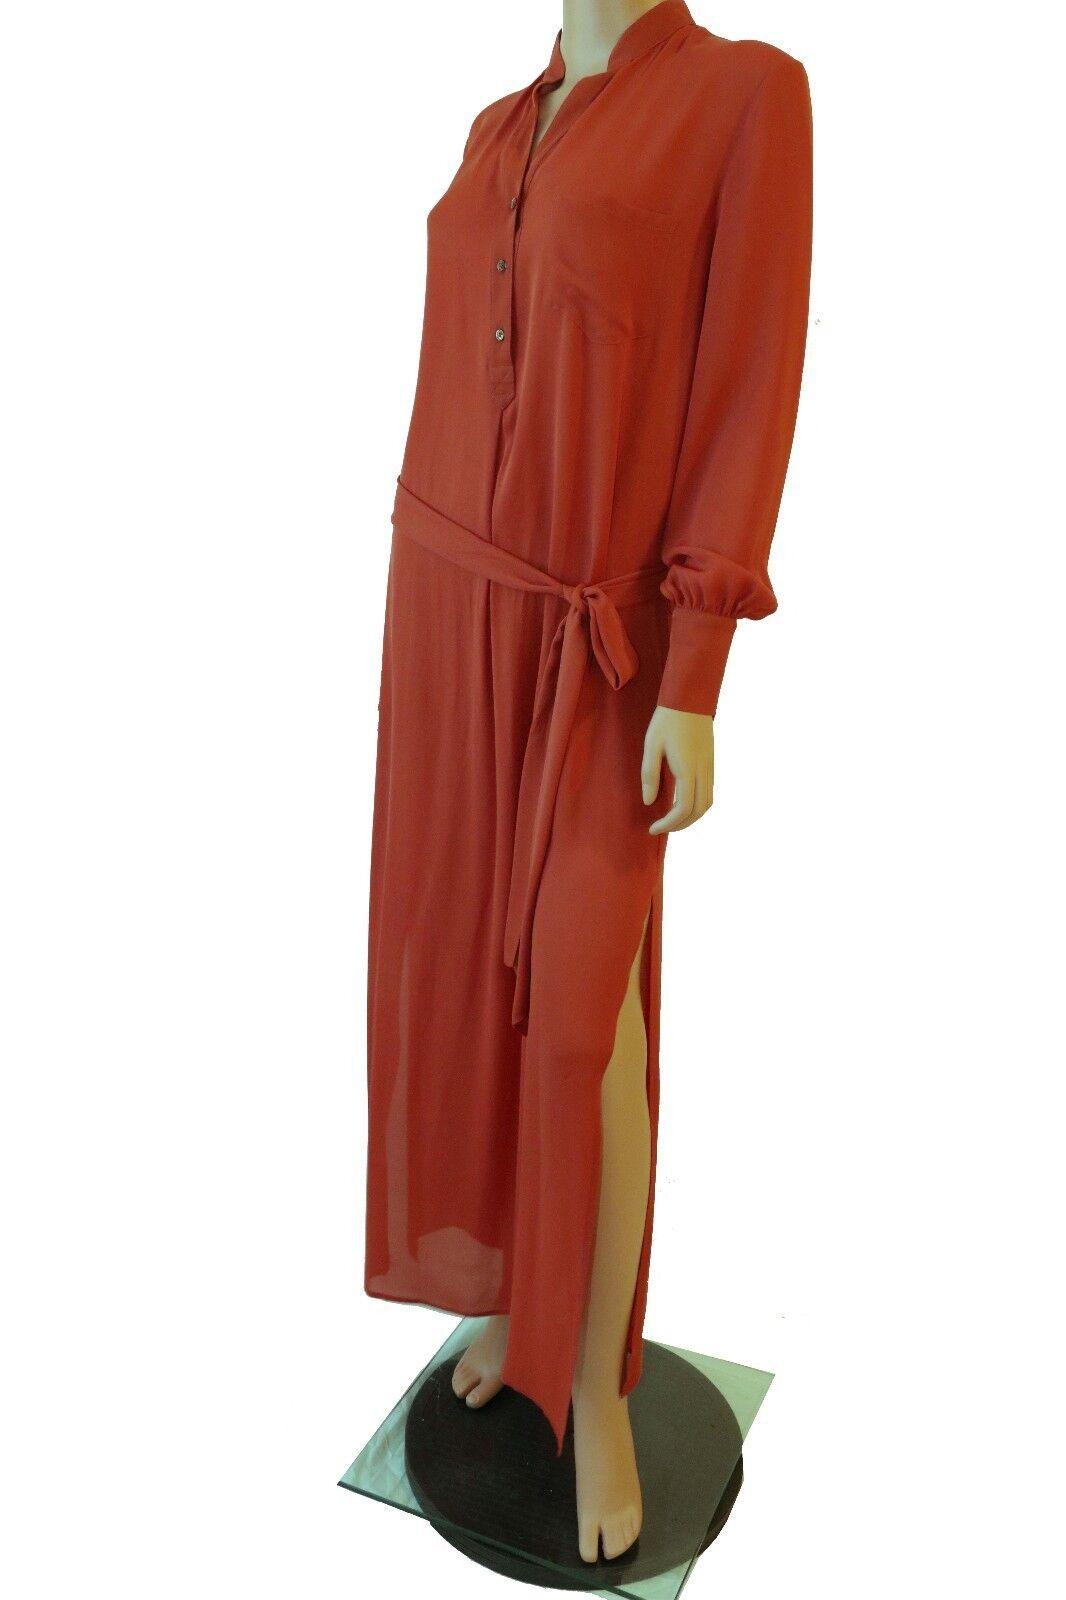 Haute Hippie Brown Long Sleeve Front Button Button Button Up Shirt Maxi Dress With Belt 0e8ad7